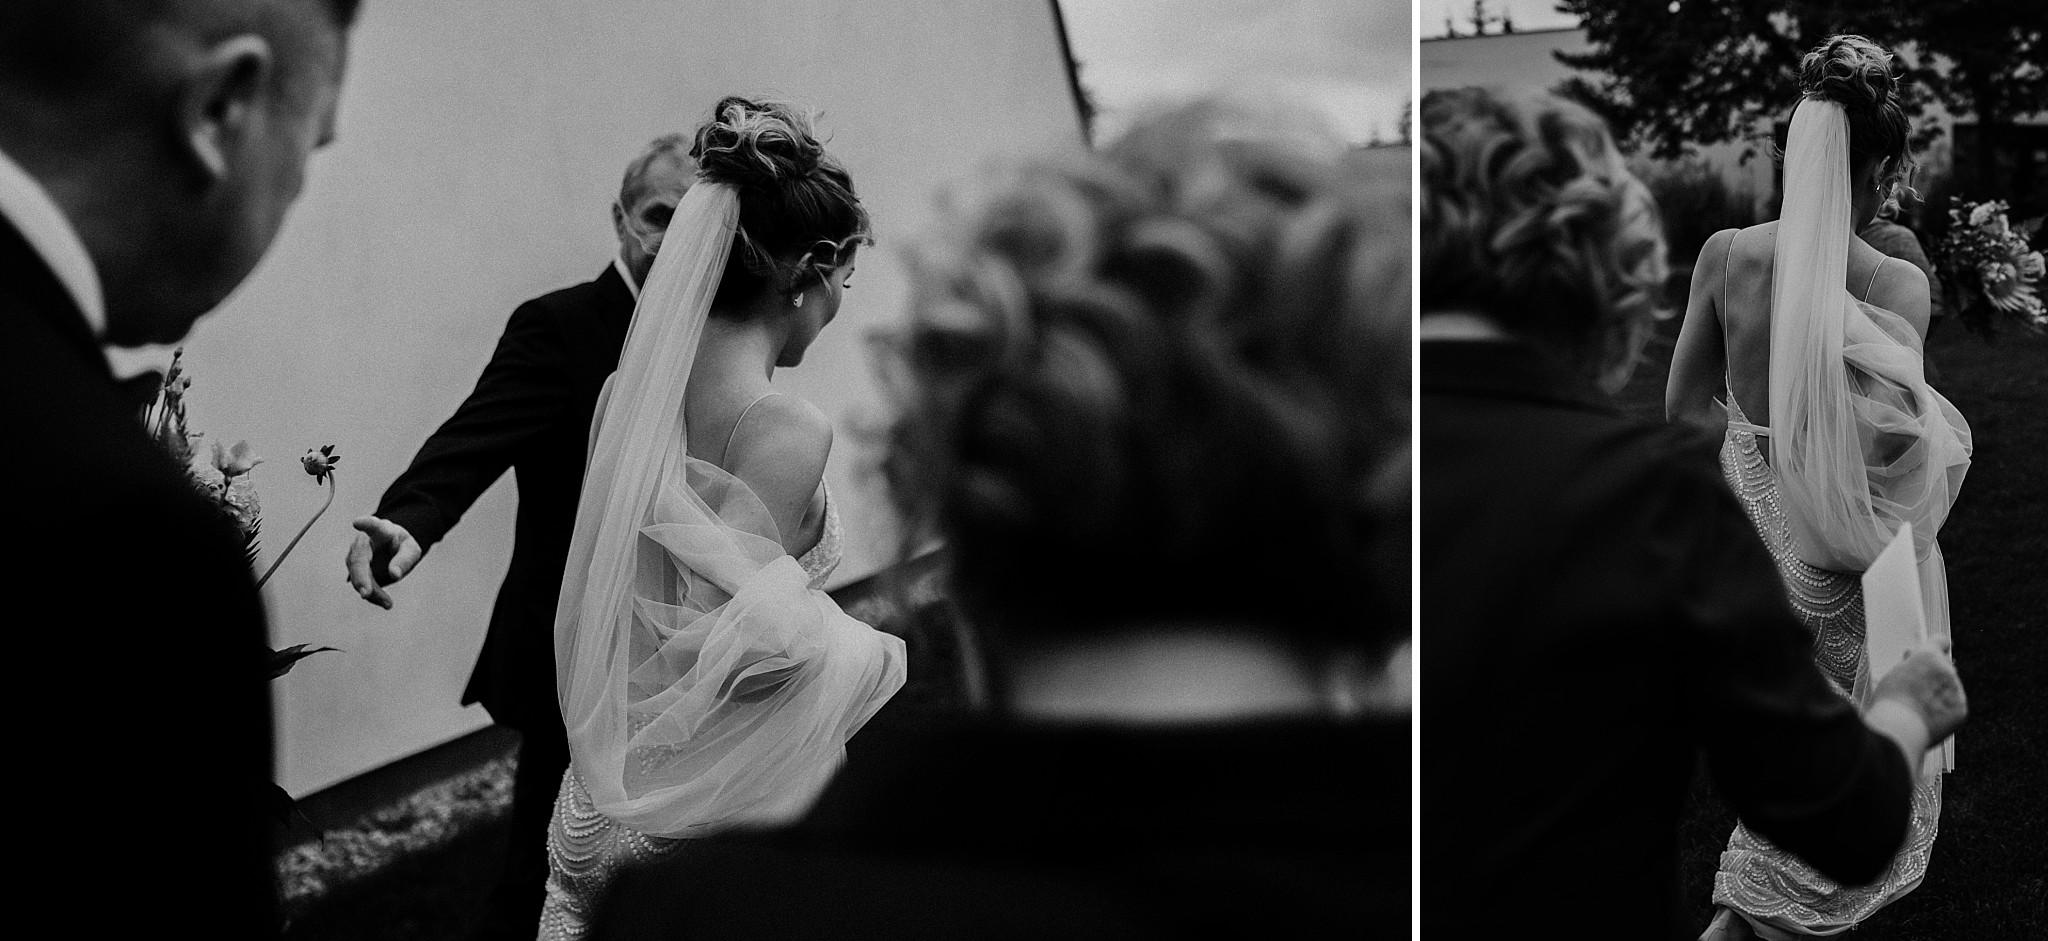 fotograf poznan wesele dobra truskawka piekne wesele pod poznaniem wesele w dobrej truskawce piekna para mloda slub marzen slub koronawirus slub listopad wesele koronawirus 112